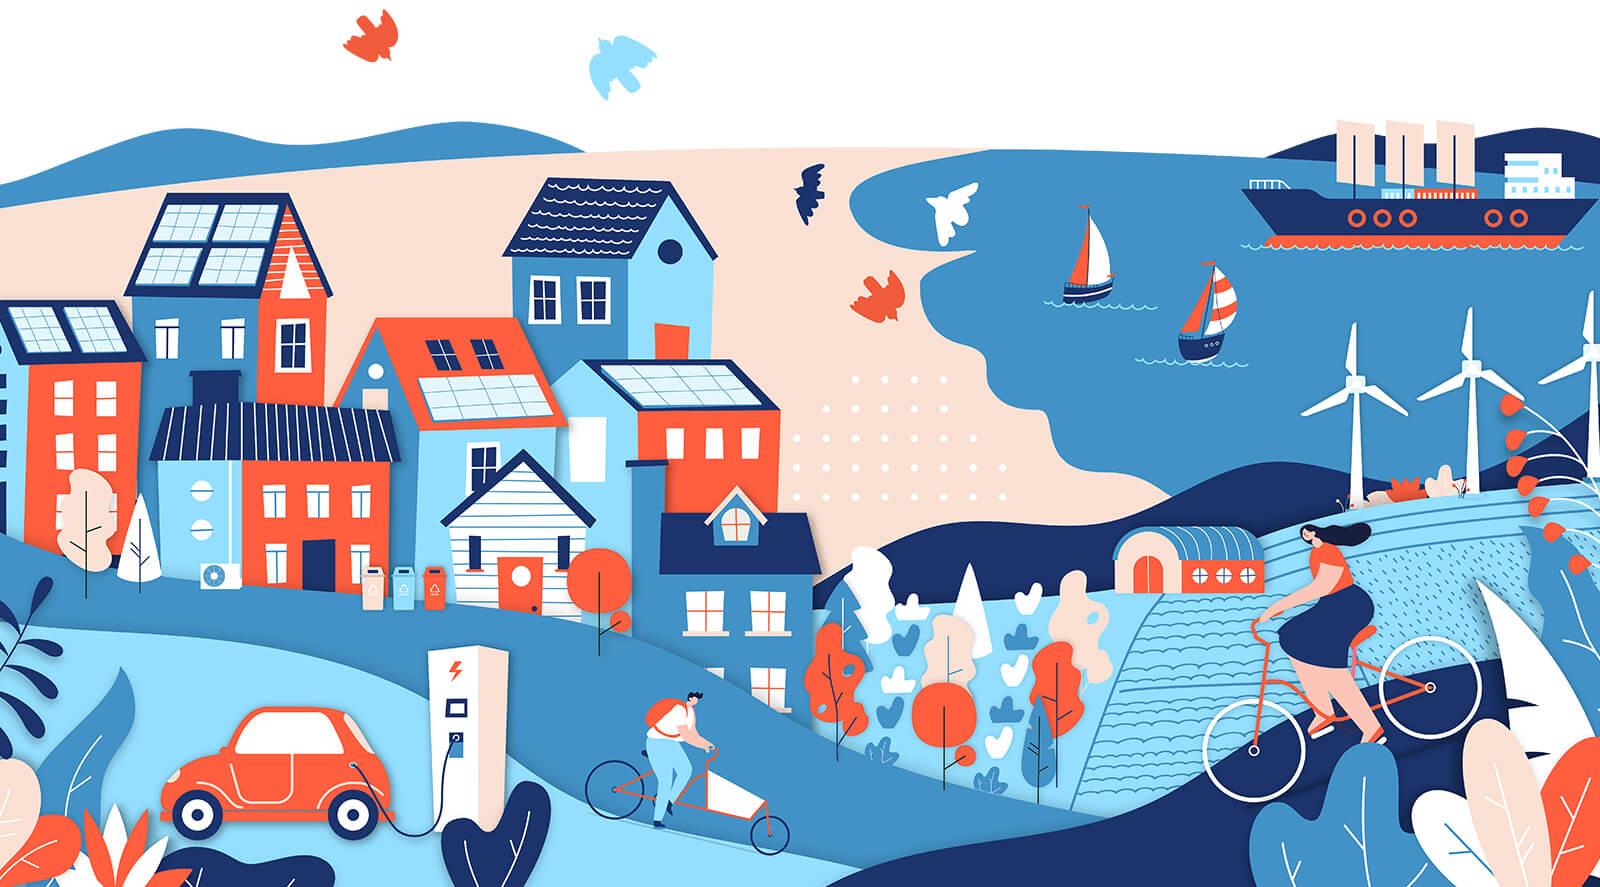 Climate Change Illustration